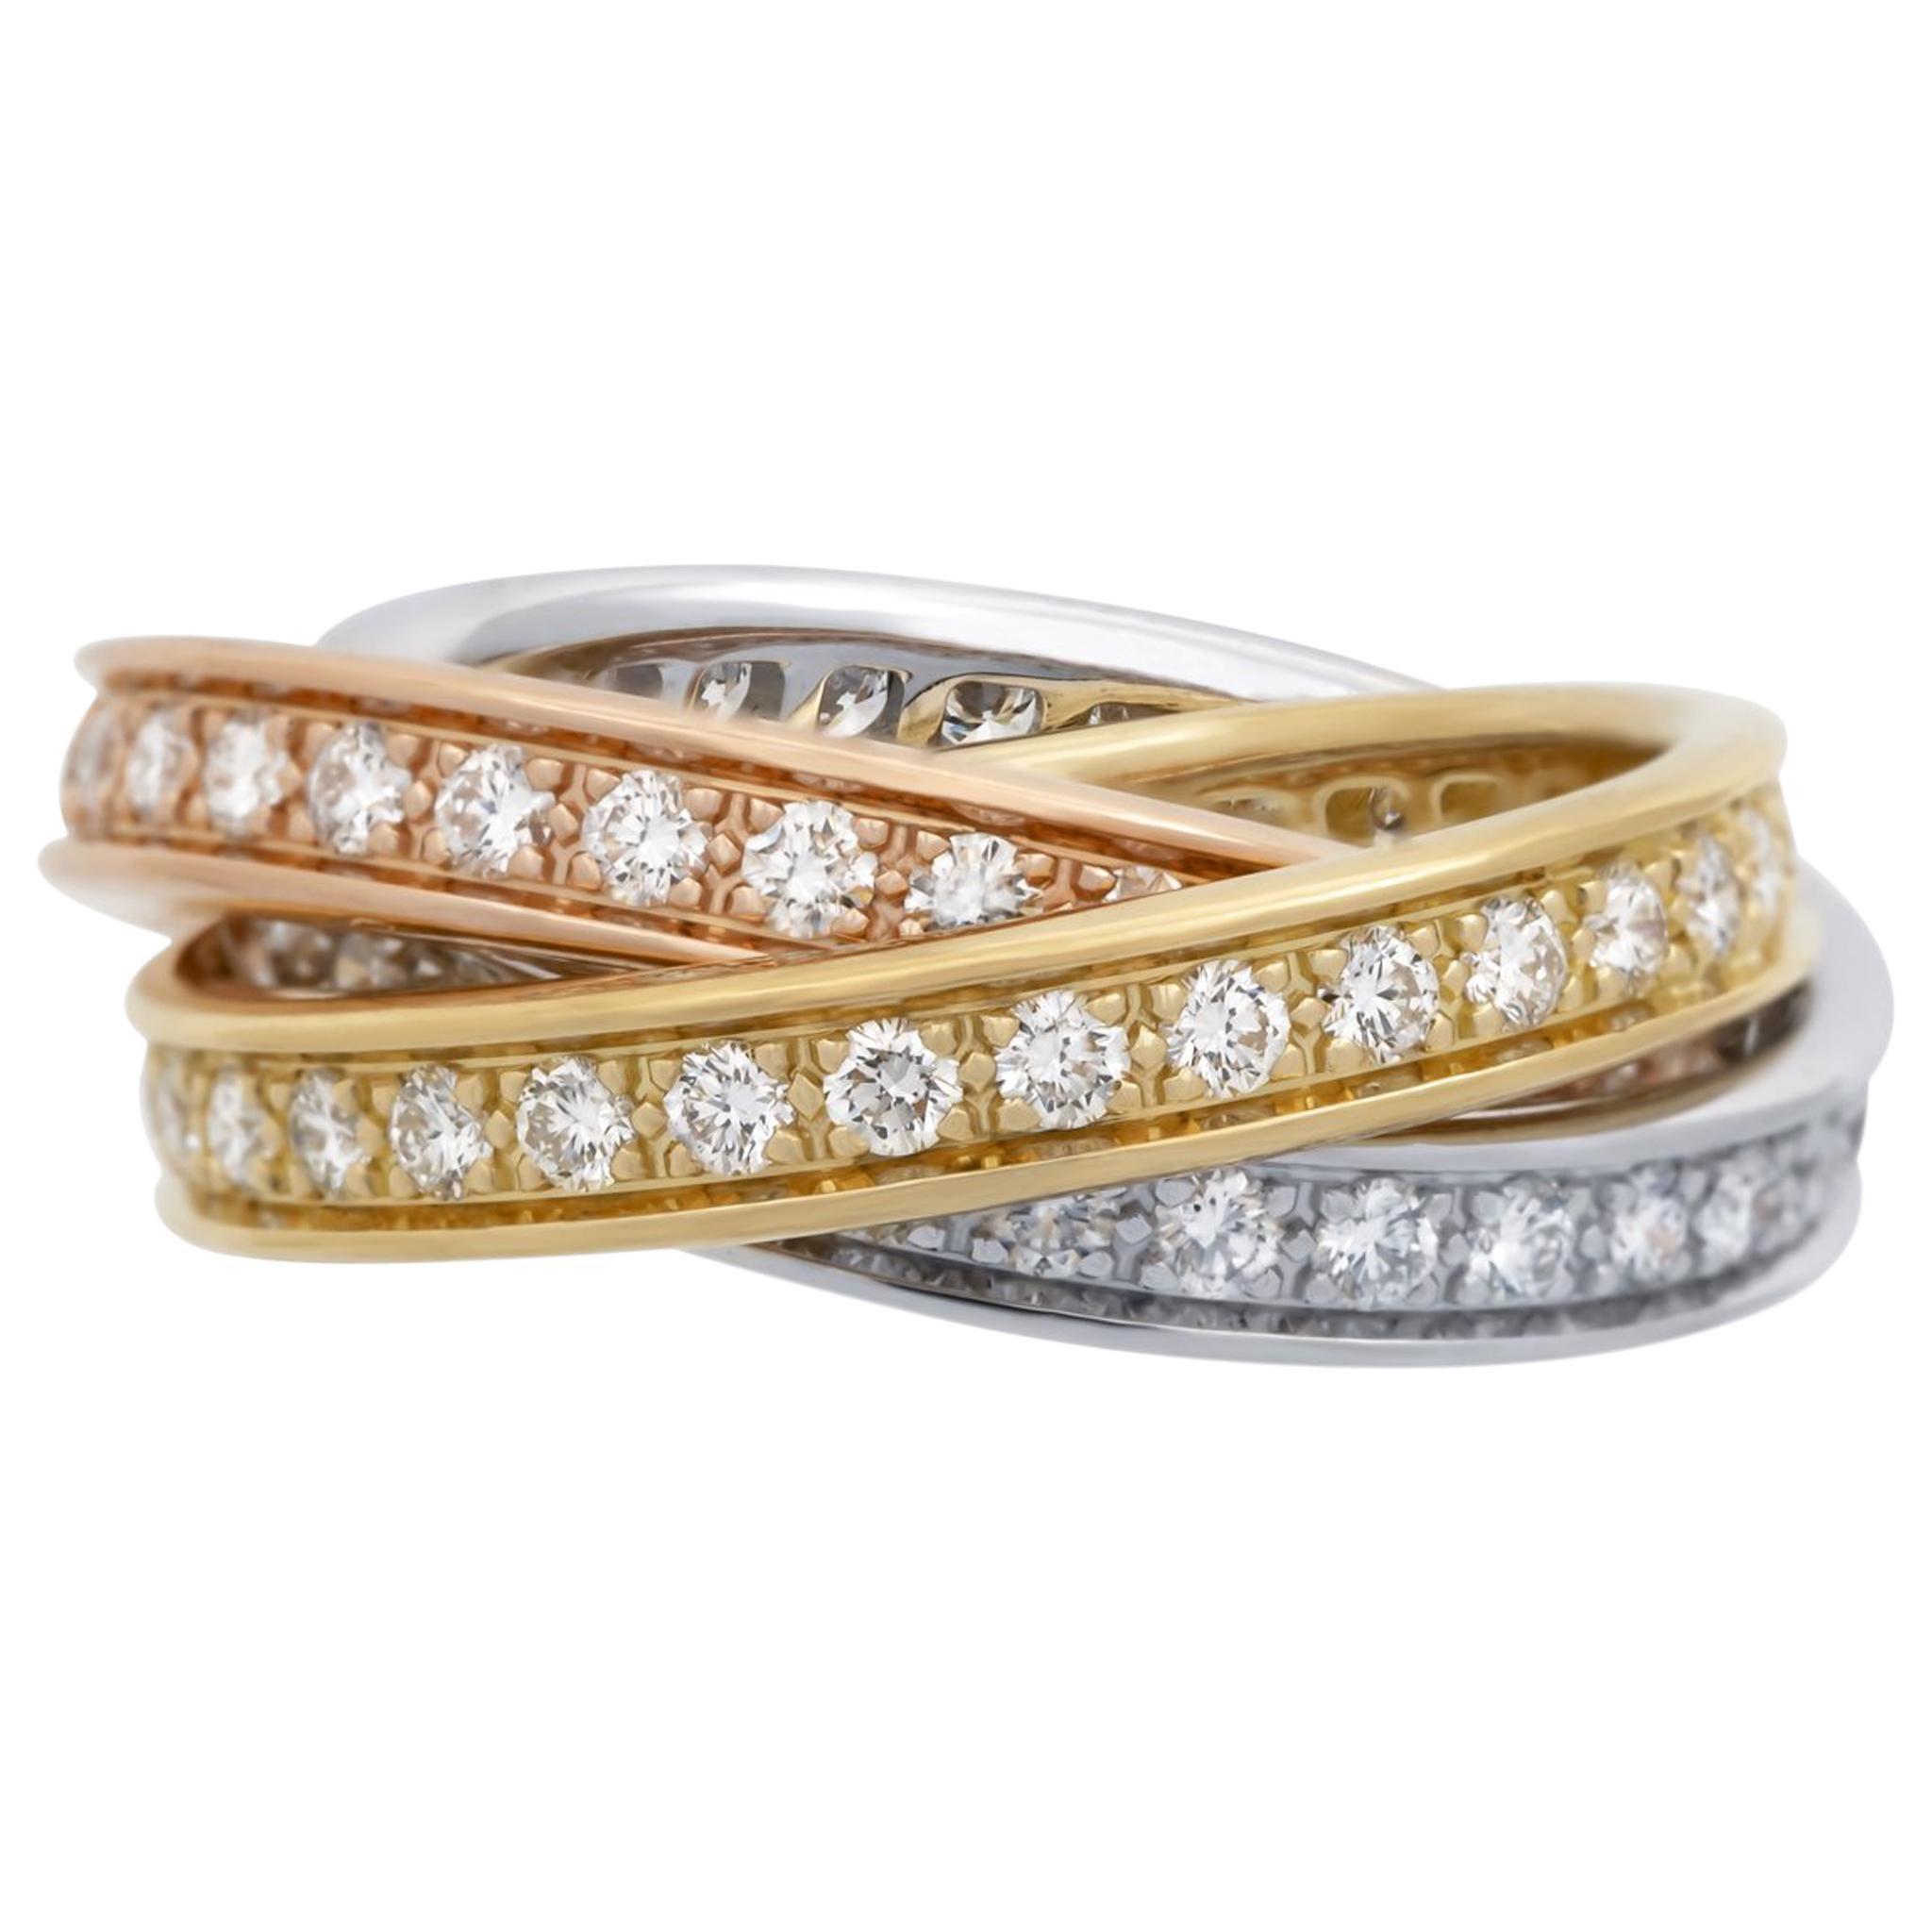 Cartier 18 Karat White, Yellow and Rose Gold Diamond Trinity Ring